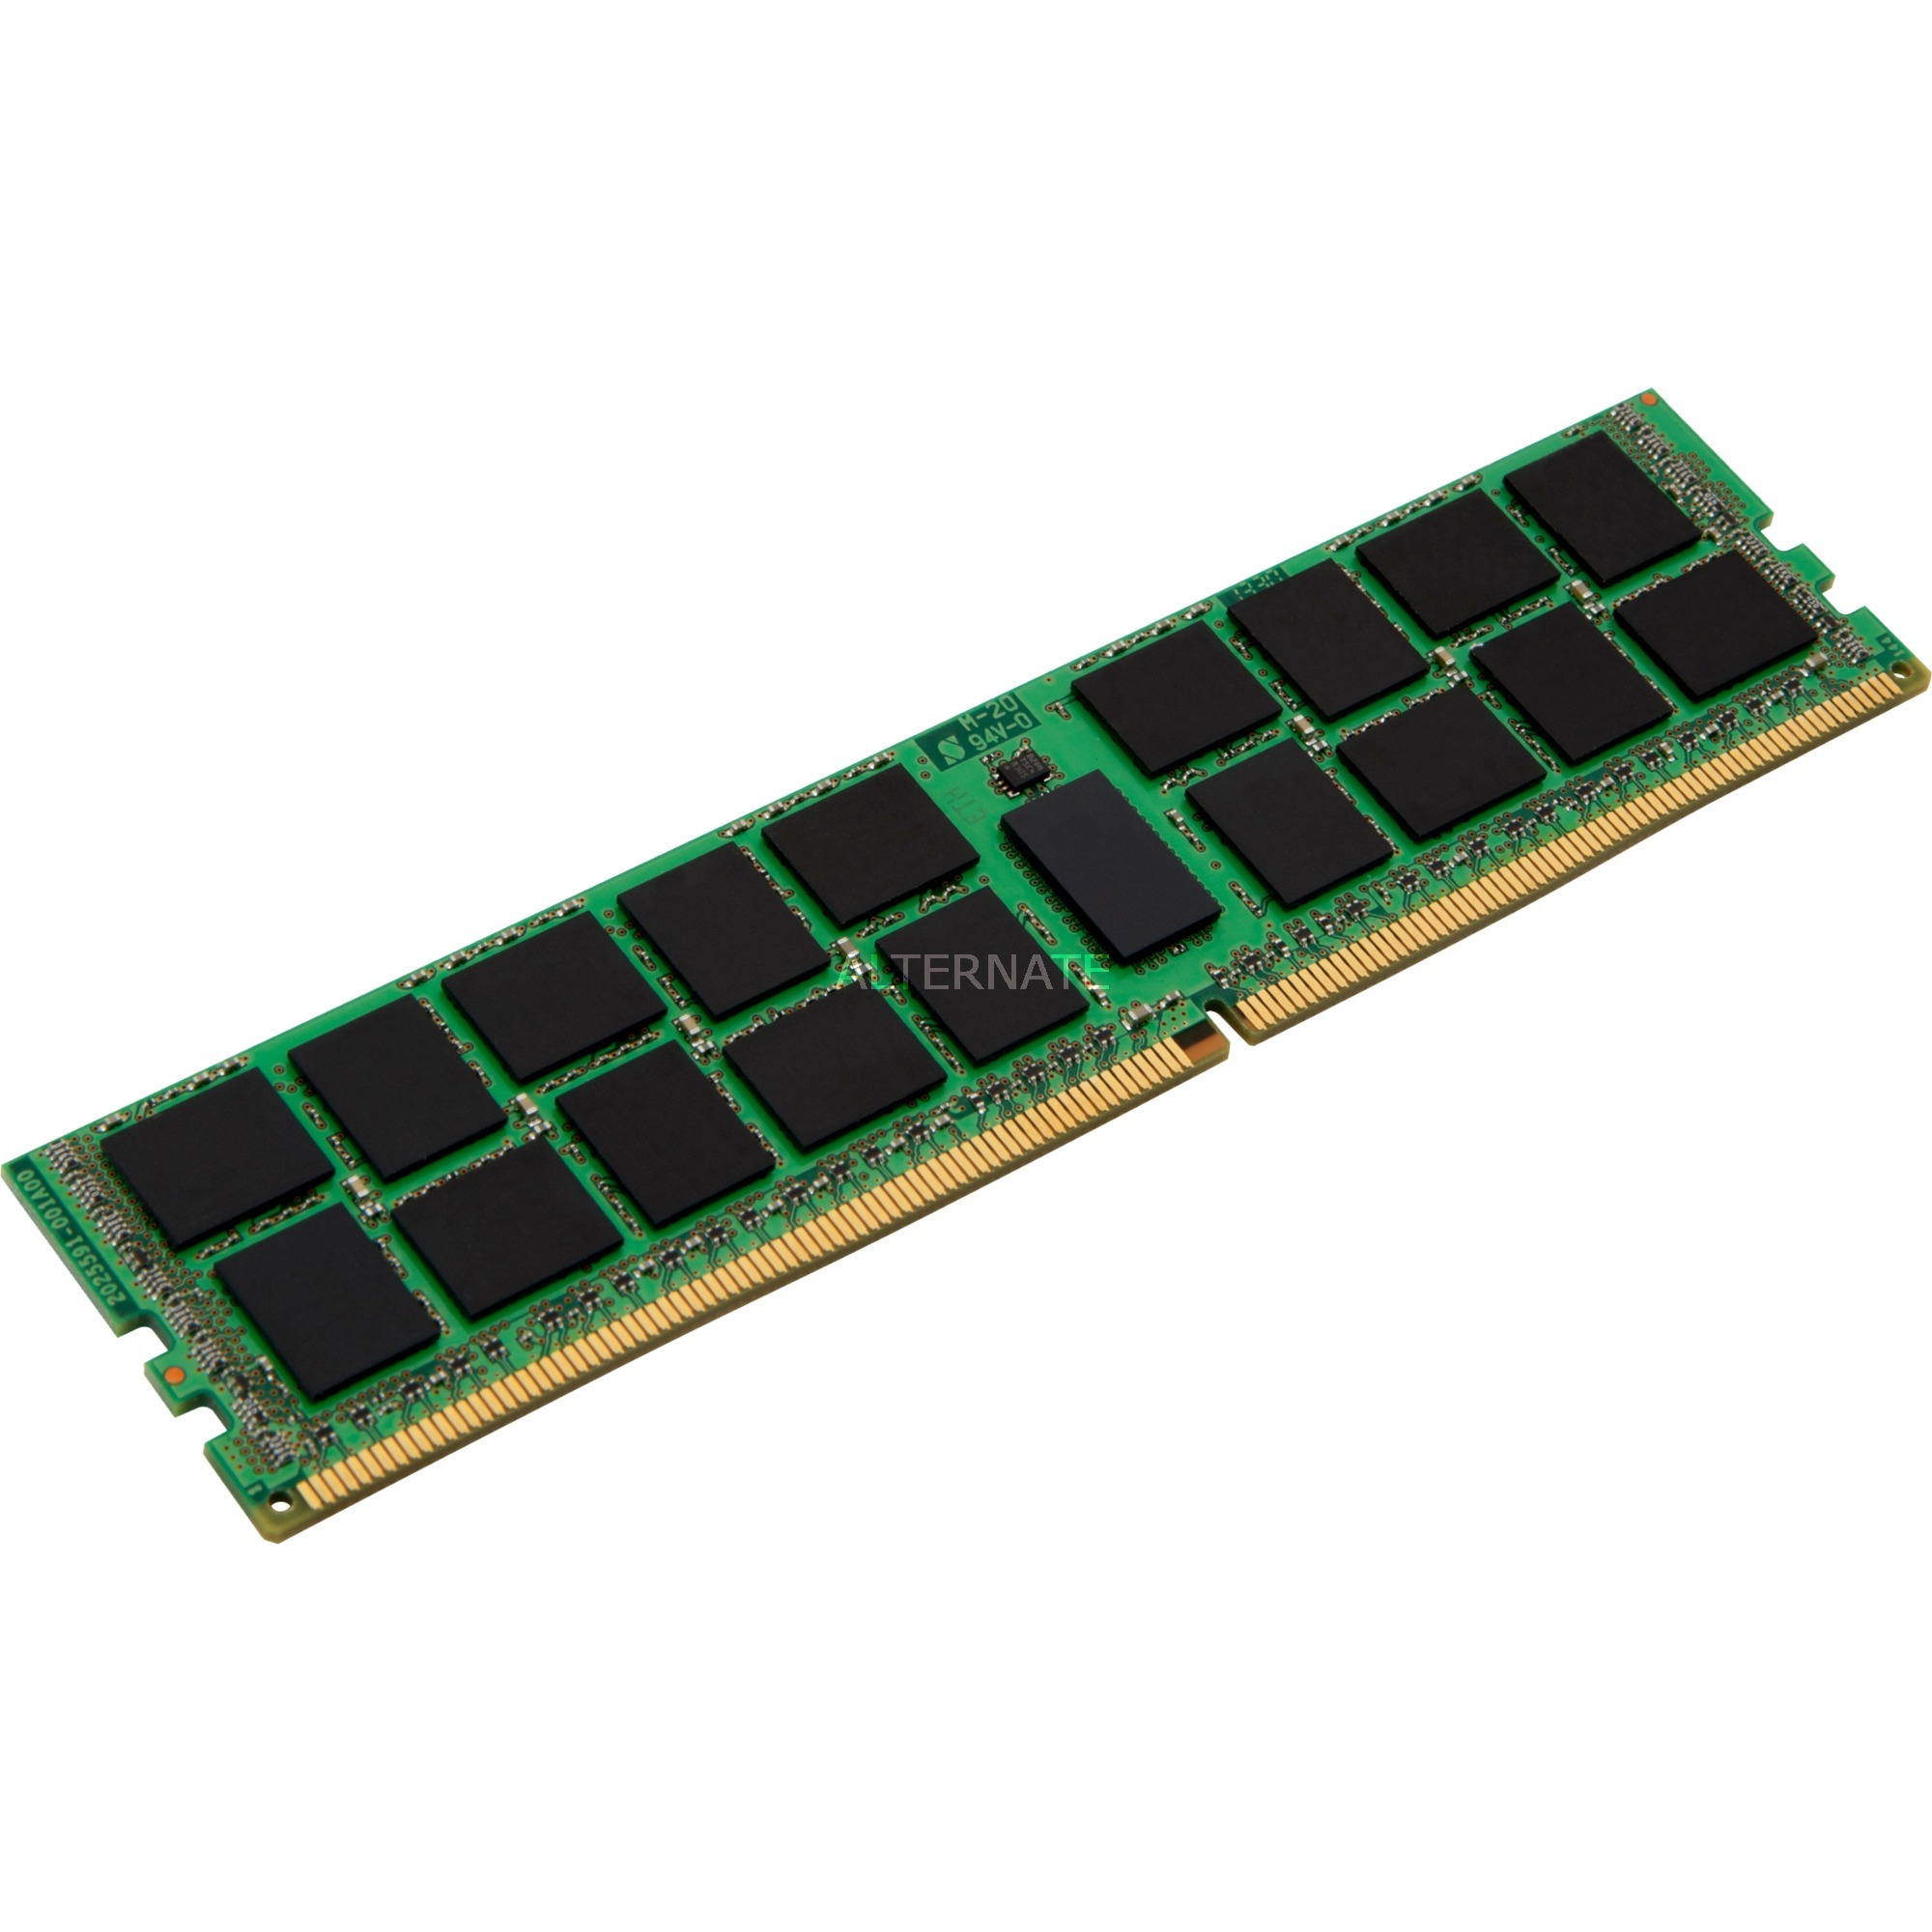 System Specific Memory 32GB DDR4 2666MHz 32GB DDR4 2666MHz ECC módulo de memoria, Memoria RAM